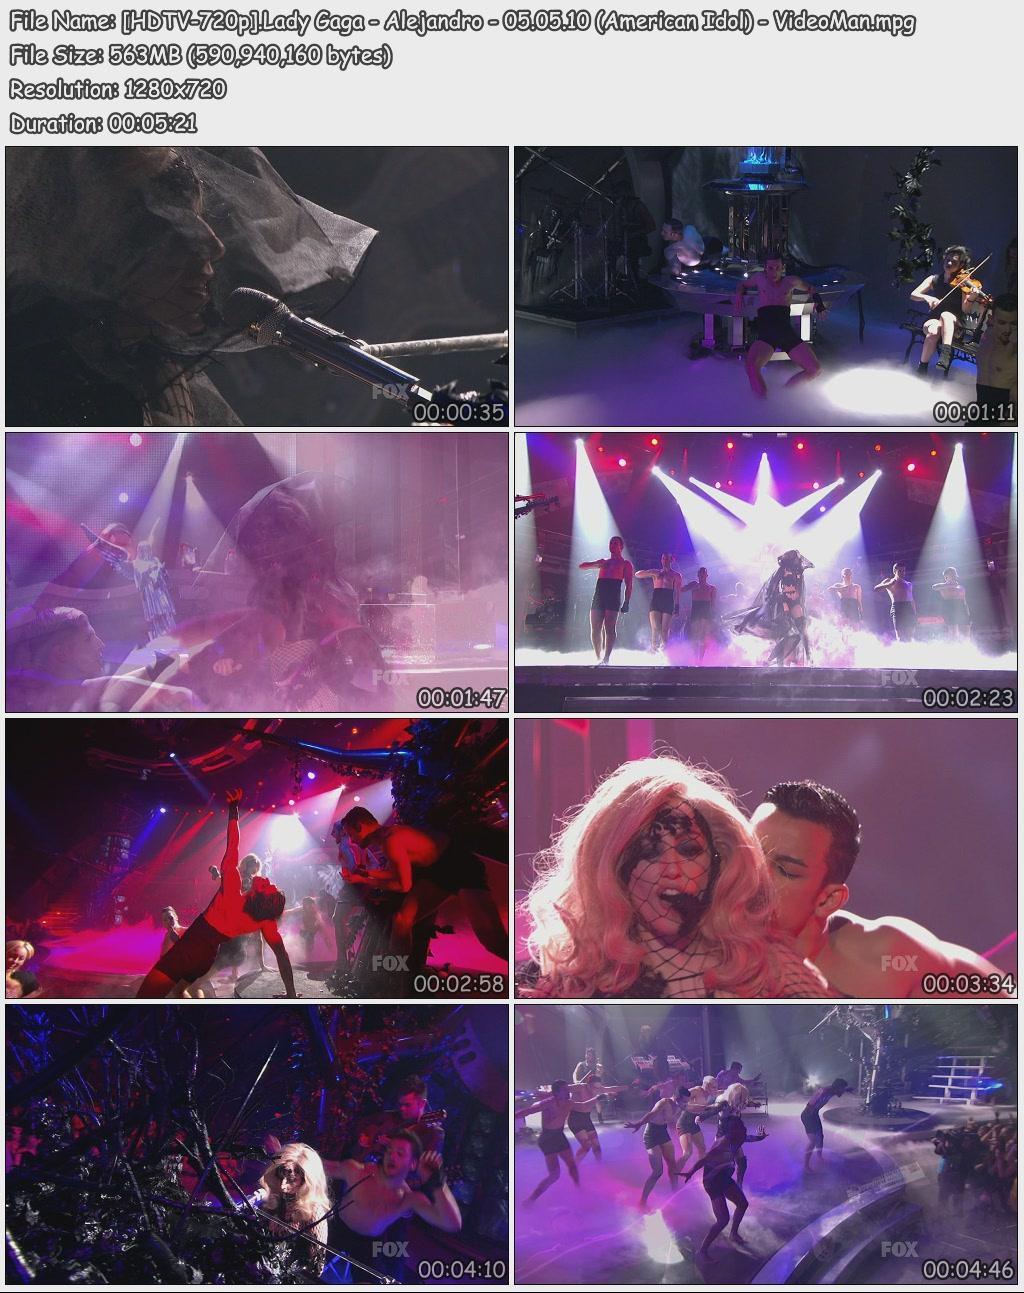 http://3.bp.blogspot.com/_6a7gthC9a1A/S_kd8IHXVsI/AAAAAAAAAEM/I6dR9GjFyQg/s1600/%5BHDTV-720p%5D.Lady+Gaga+-+Alejandro+-+05.05.10+(American+Idol)+-+VideoMan.jpg